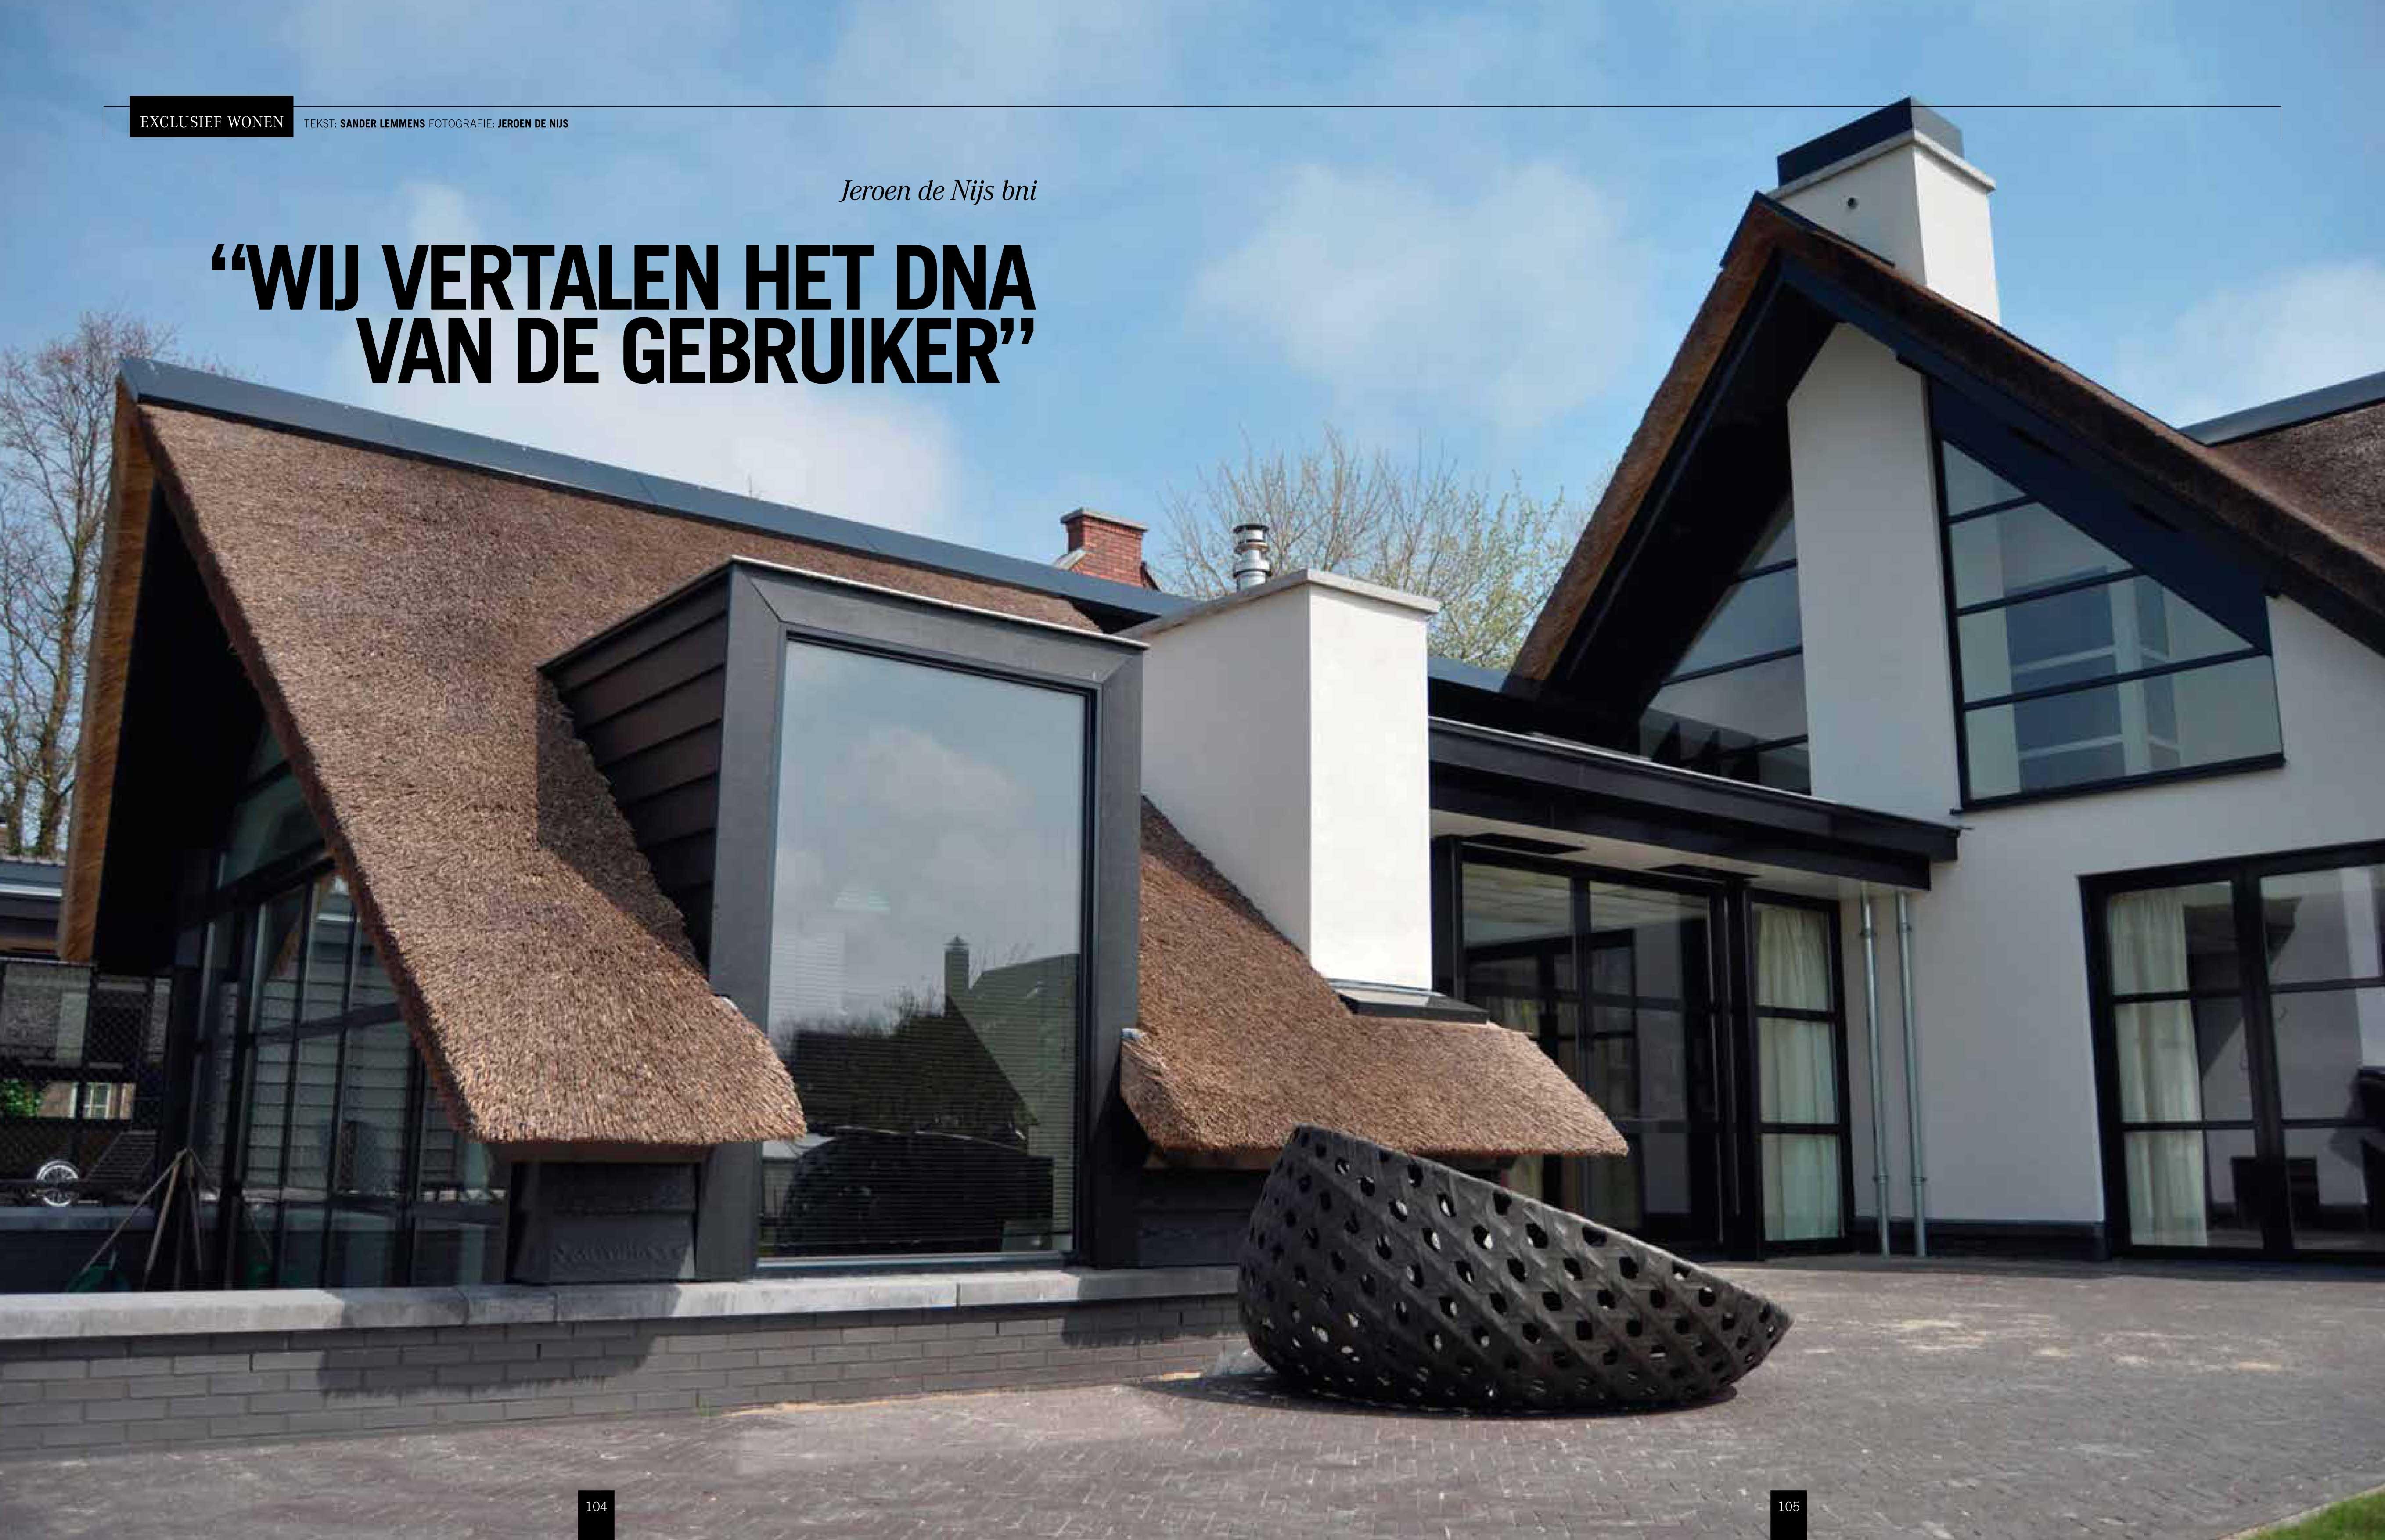 Jeroen de Nijs interview-1